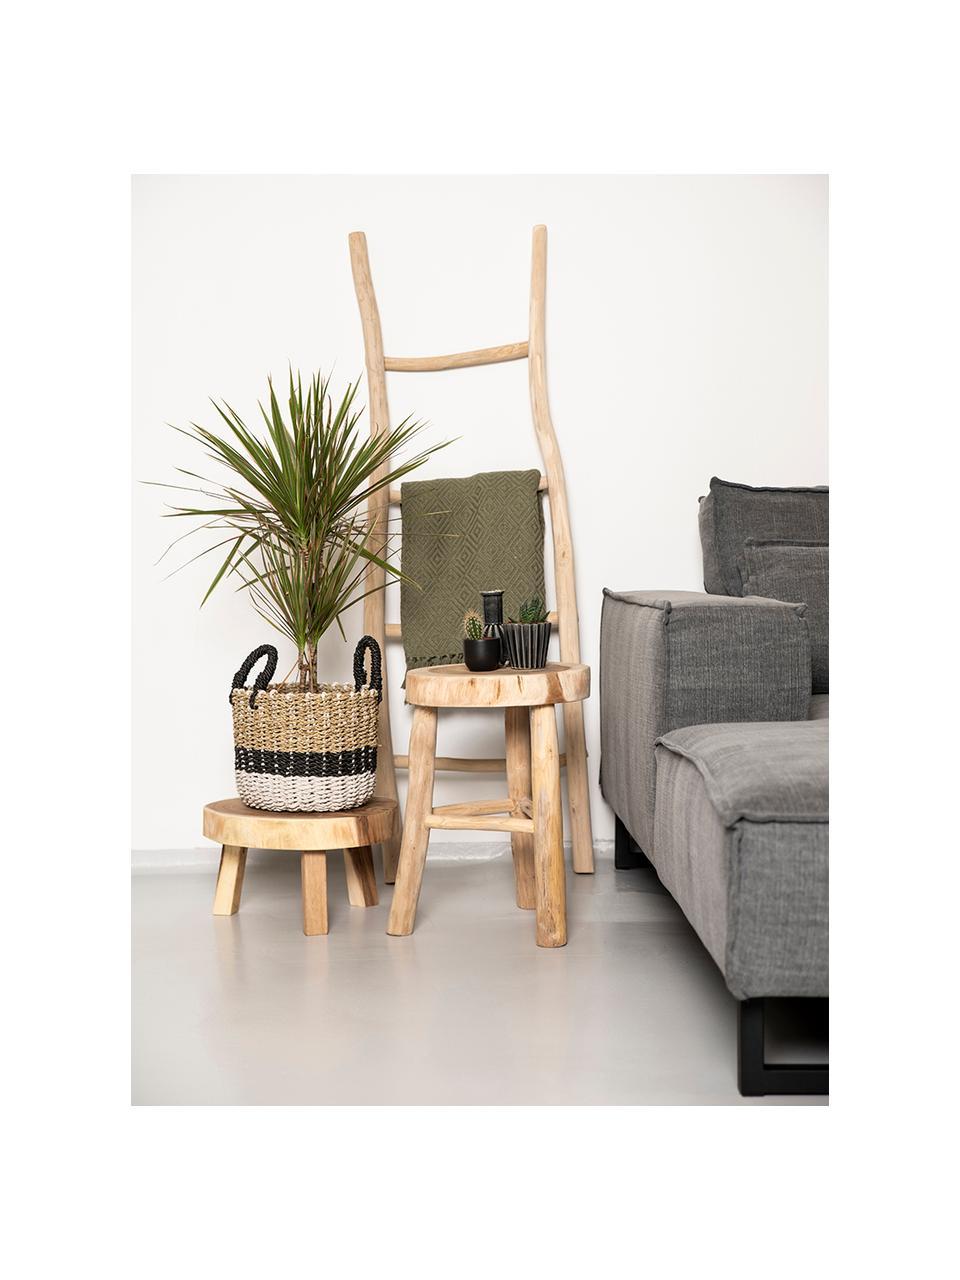 Handtuchleiter Token aus Teakholz, Teakholz, Braun, 45 x 150 cm